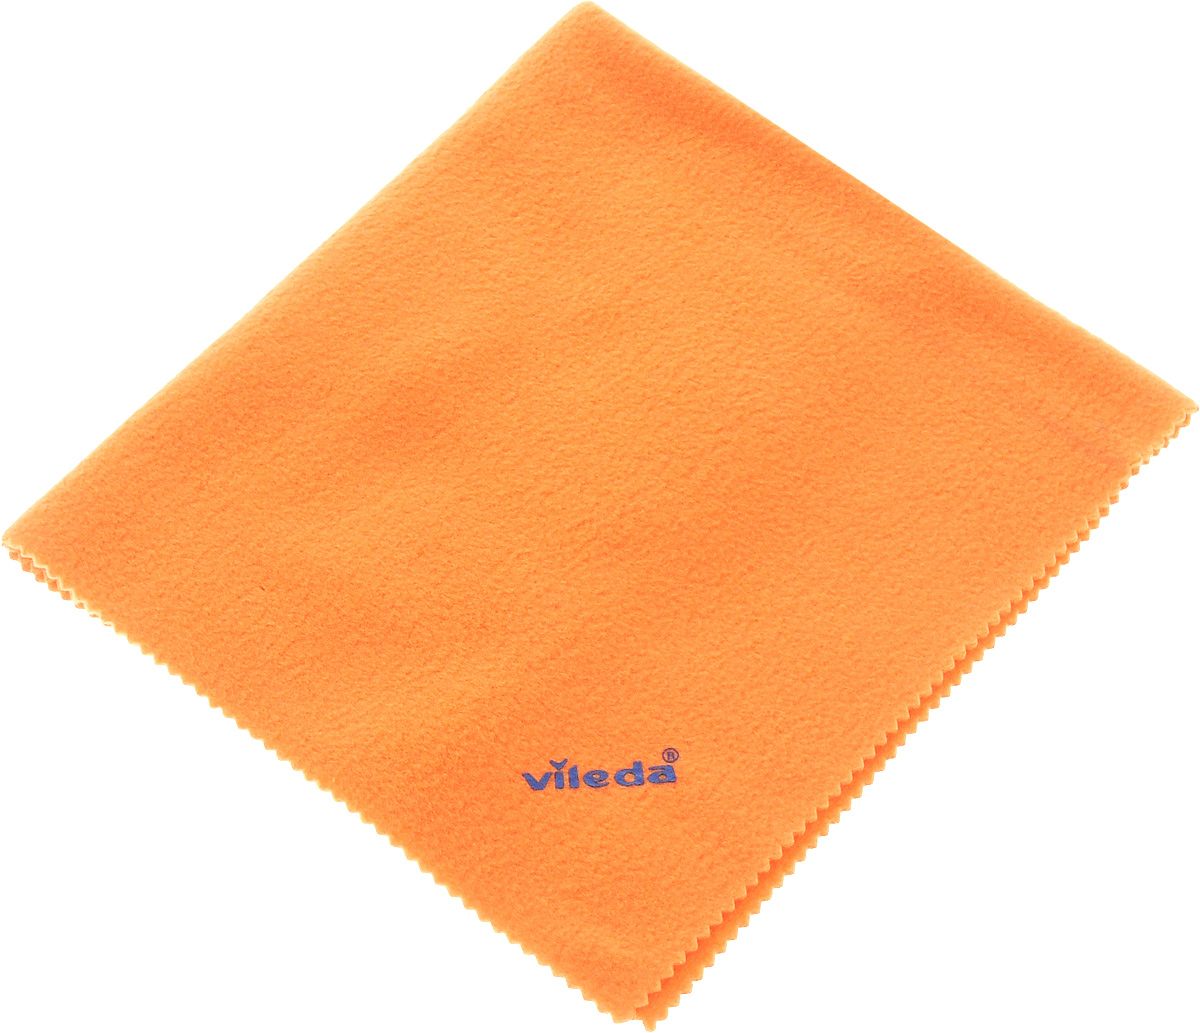 Салфетка для уборки Vileda Soft Dust Cloth, 40 х 30 см салфетка vileda актифайбр